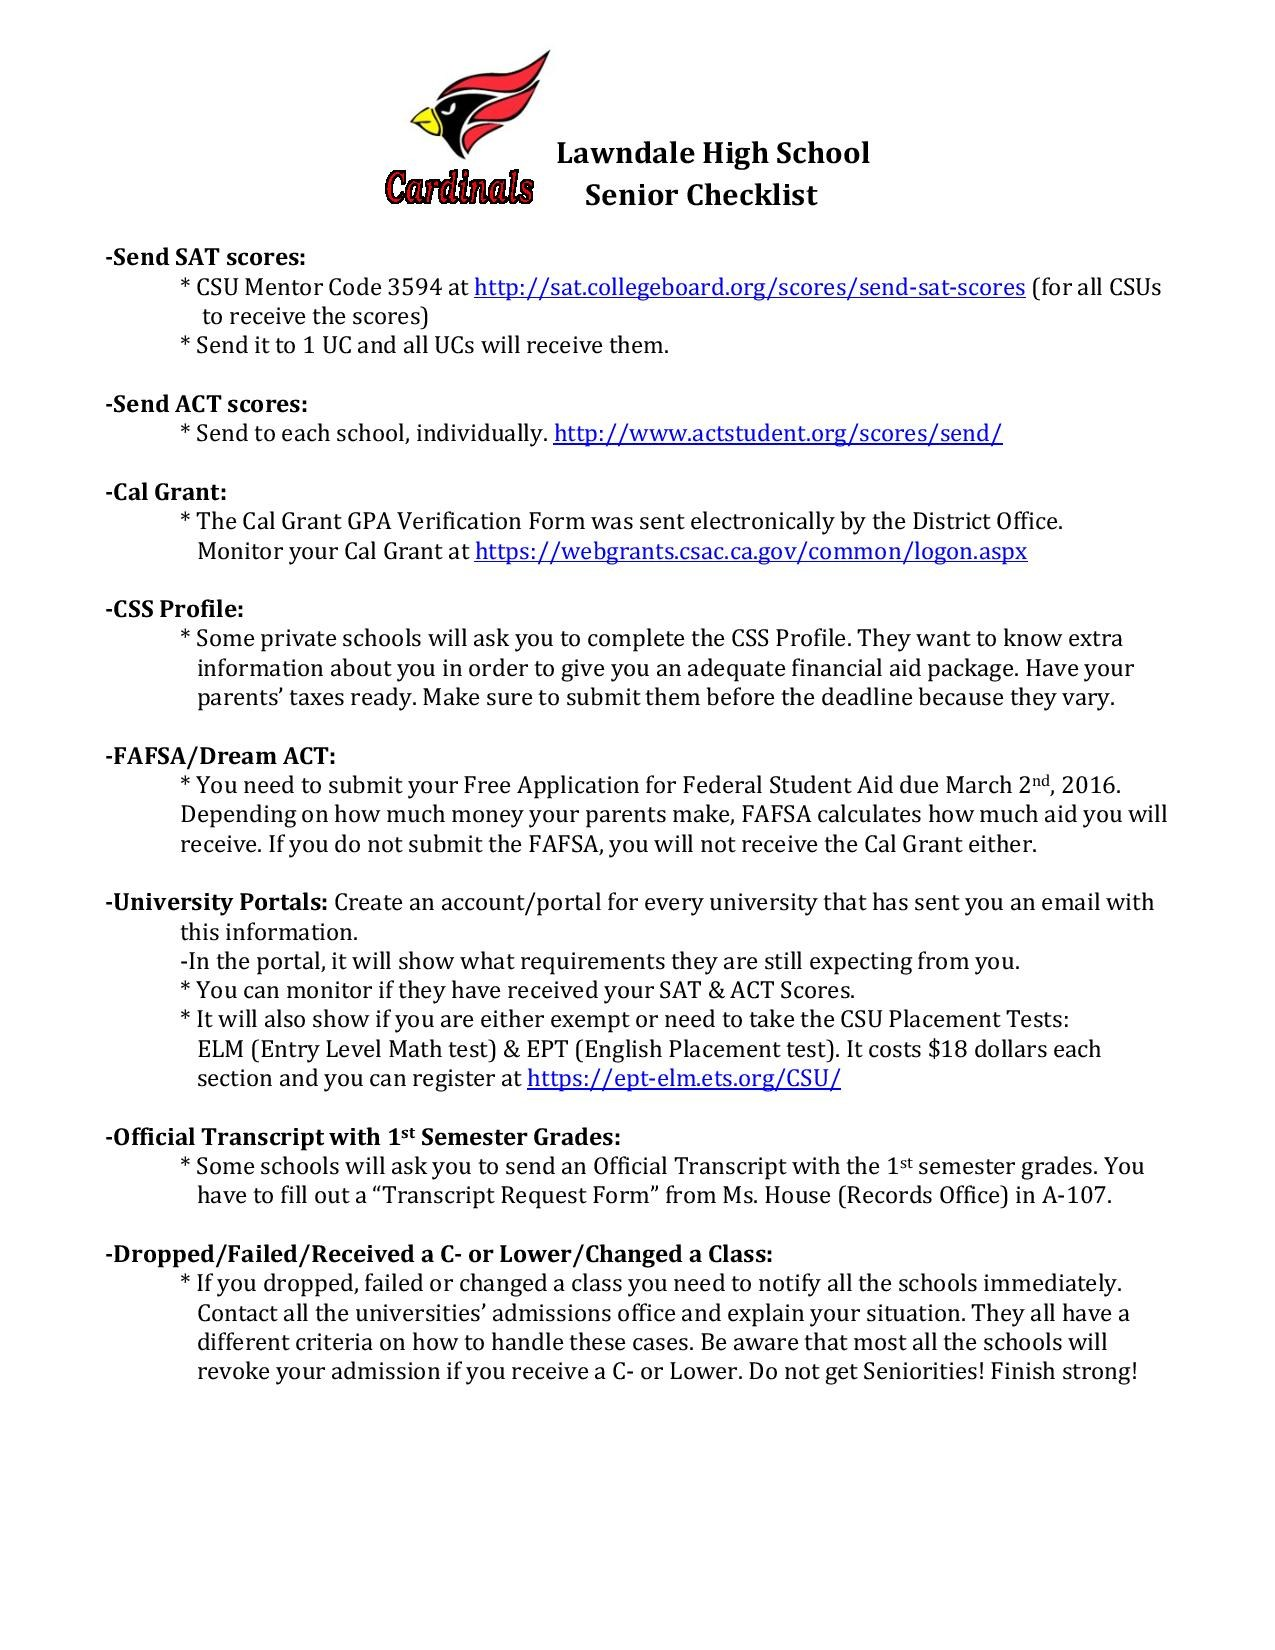 Senior Checklist Counseling Lawndale High School